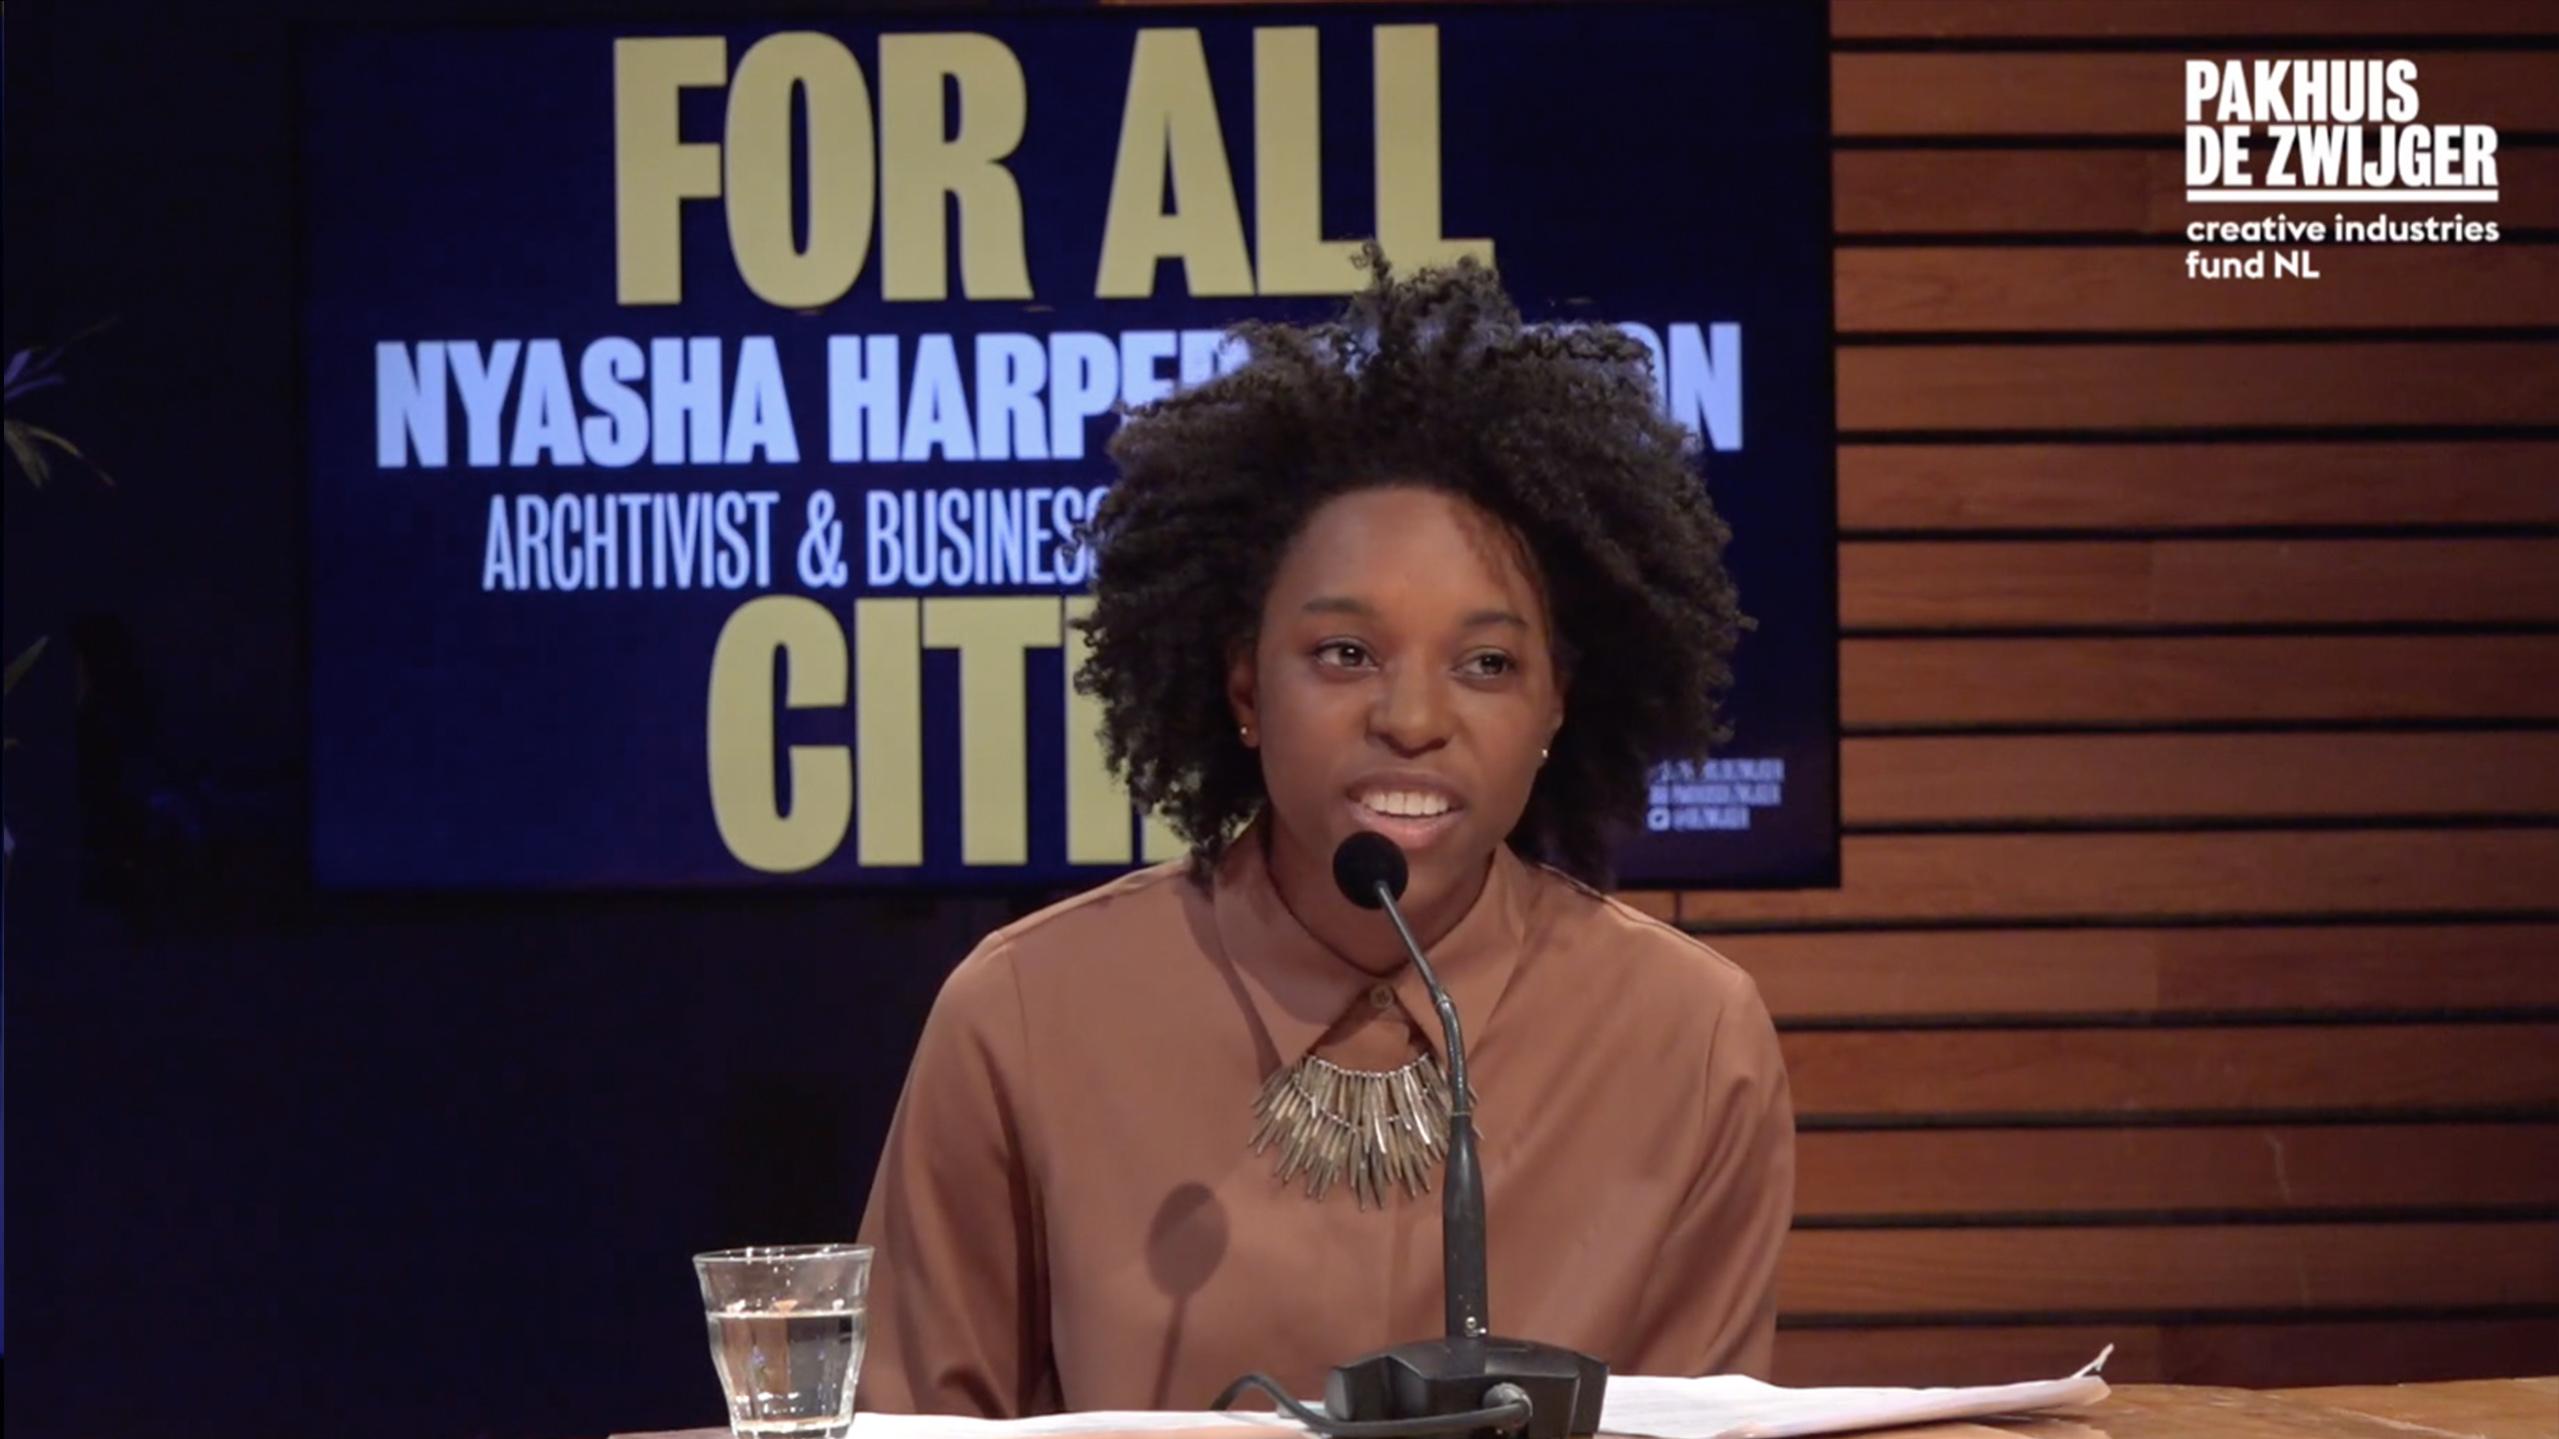 Designing Cities for All - Planet City - Pakhuis de Zwijger - Nyasha Harper-Michon